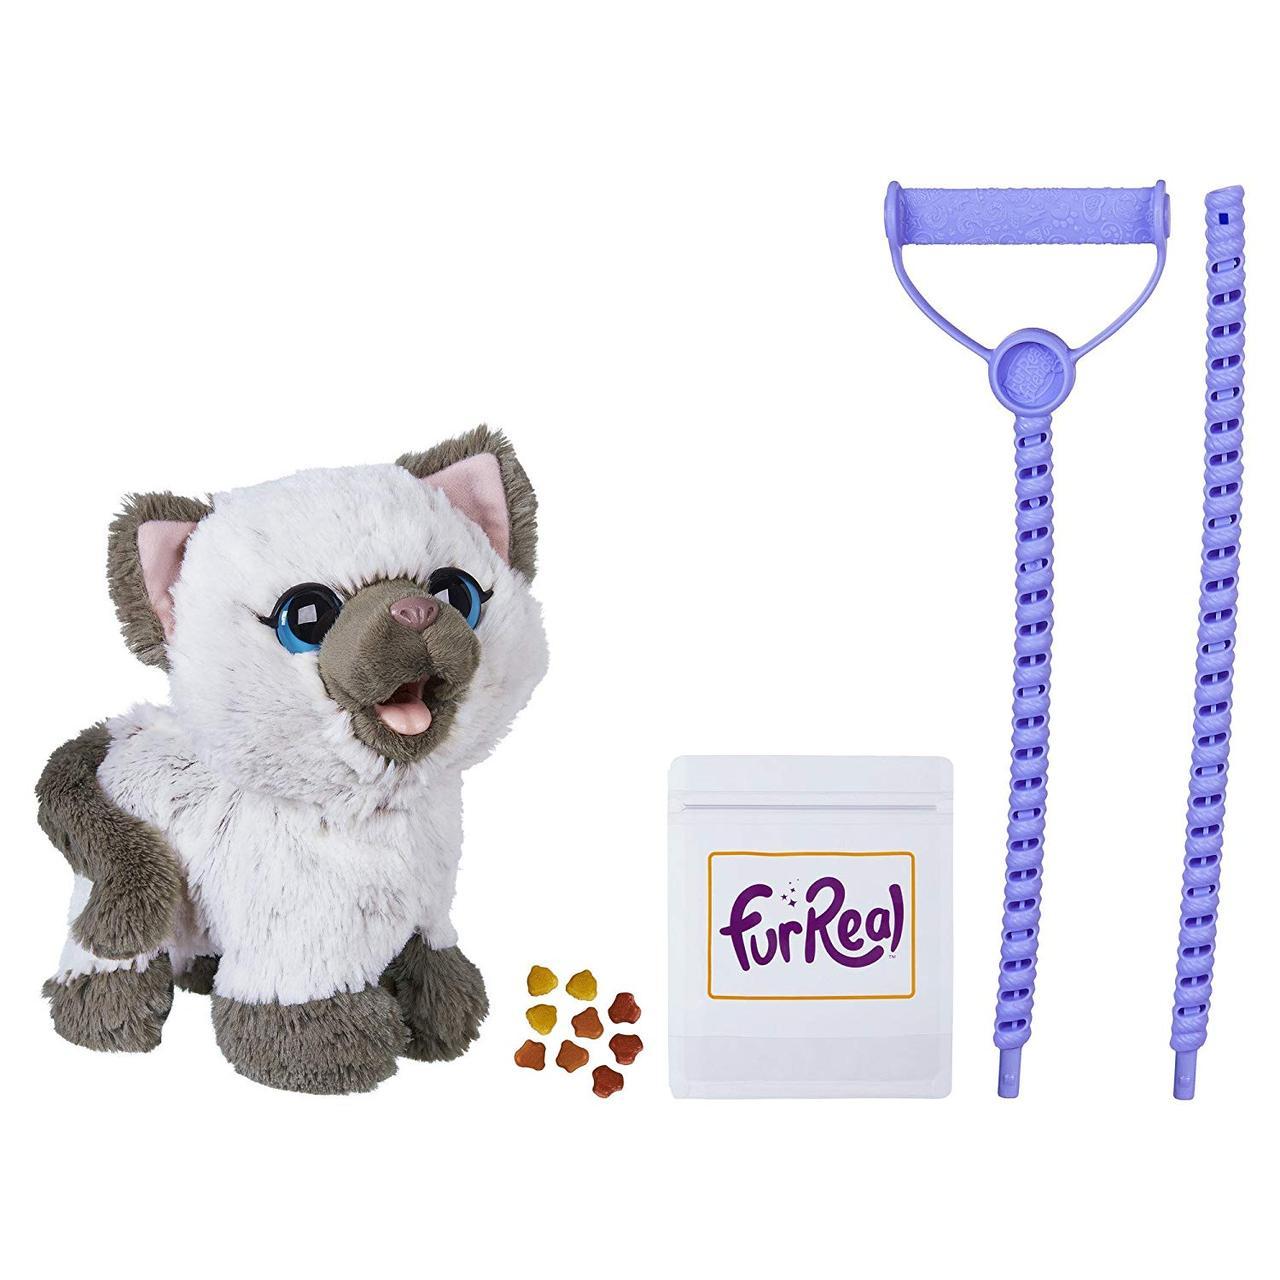 Интерактивный котенок Ками, кушает, ходит FurReal Friends Kami Poopin Kitty Toy, Hasbro Оригинал